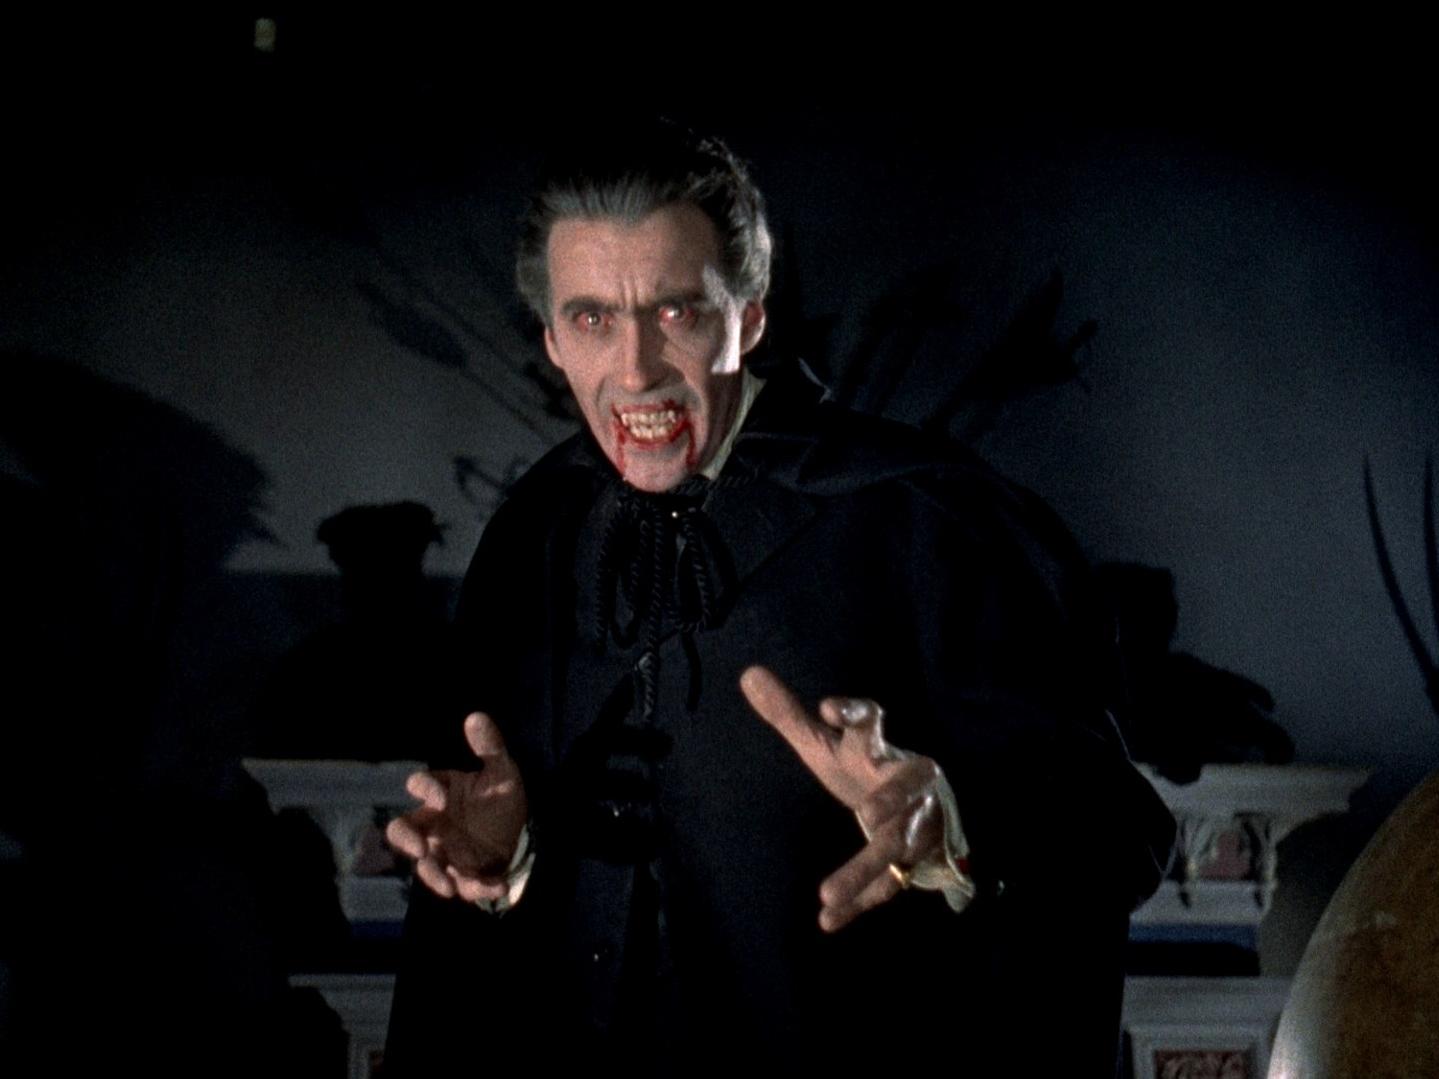 Horror-of-Dracula-1958_t00.mkv_snapshot_00.15.33.708